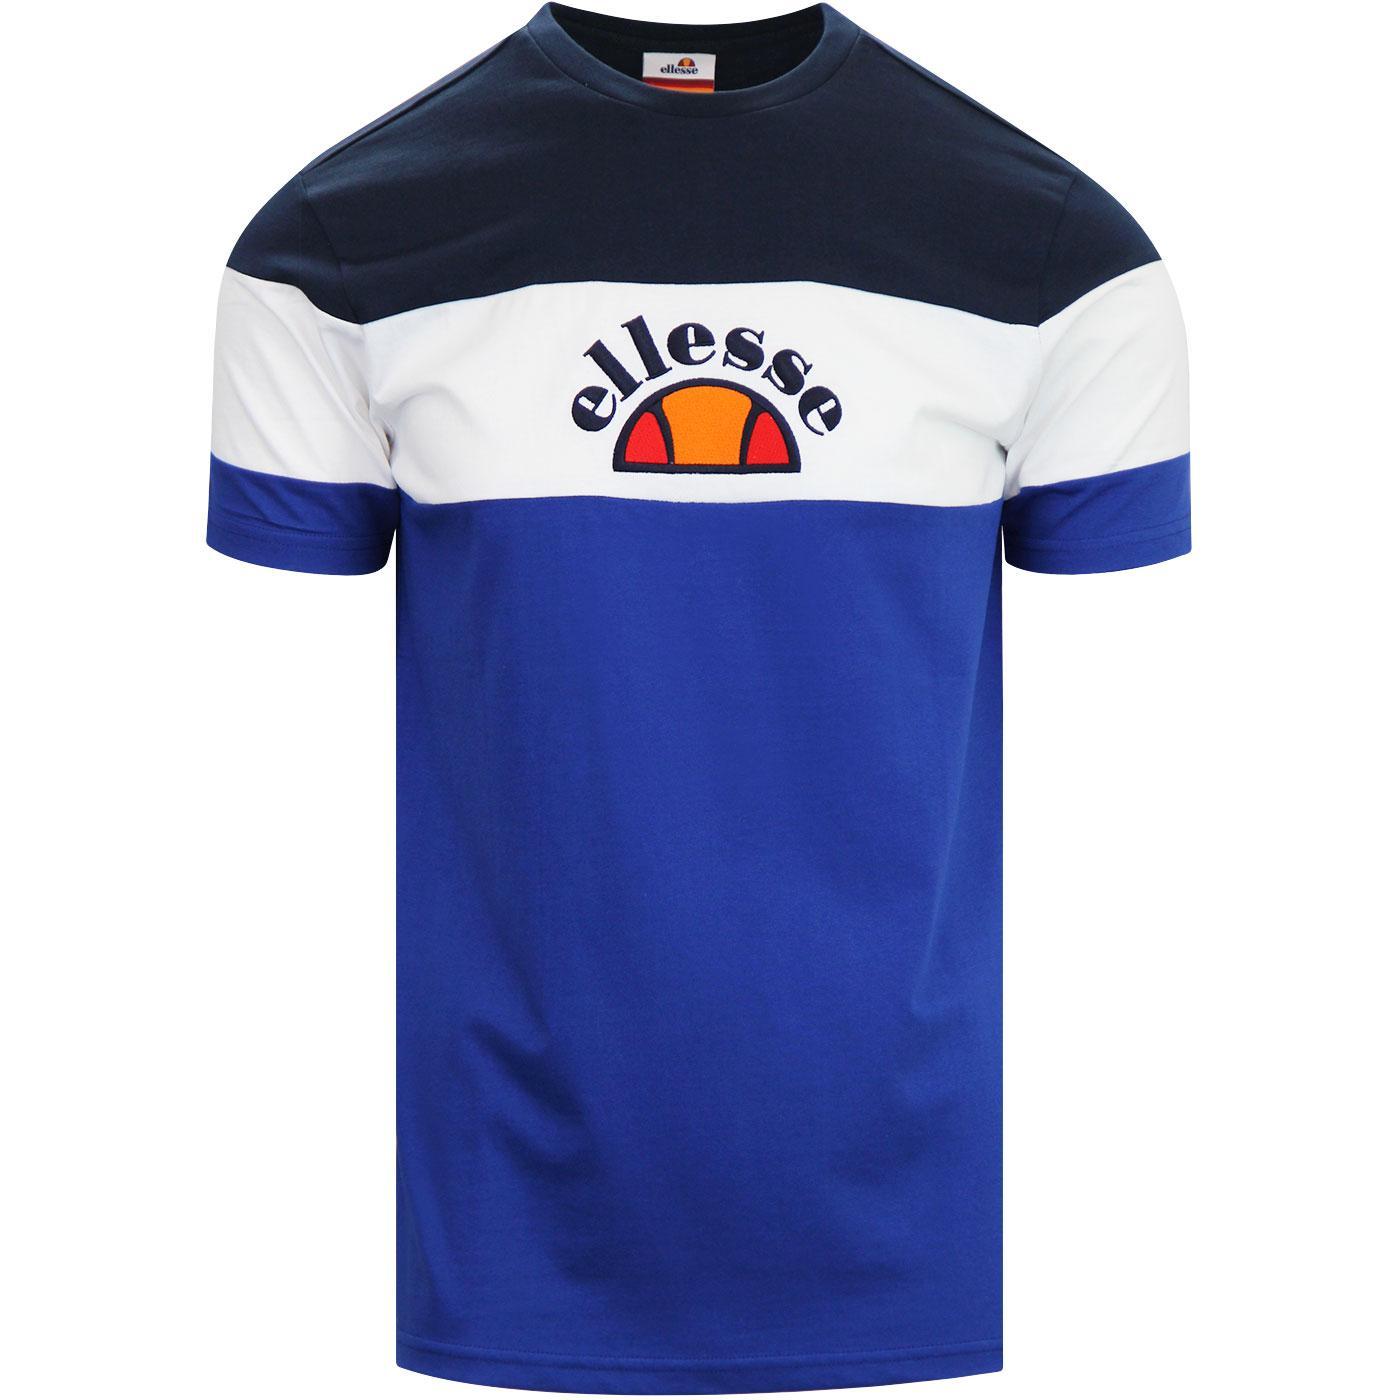 Juby ELLESSE Retro 80s Cut & Sew Panel T-Shirt Bl